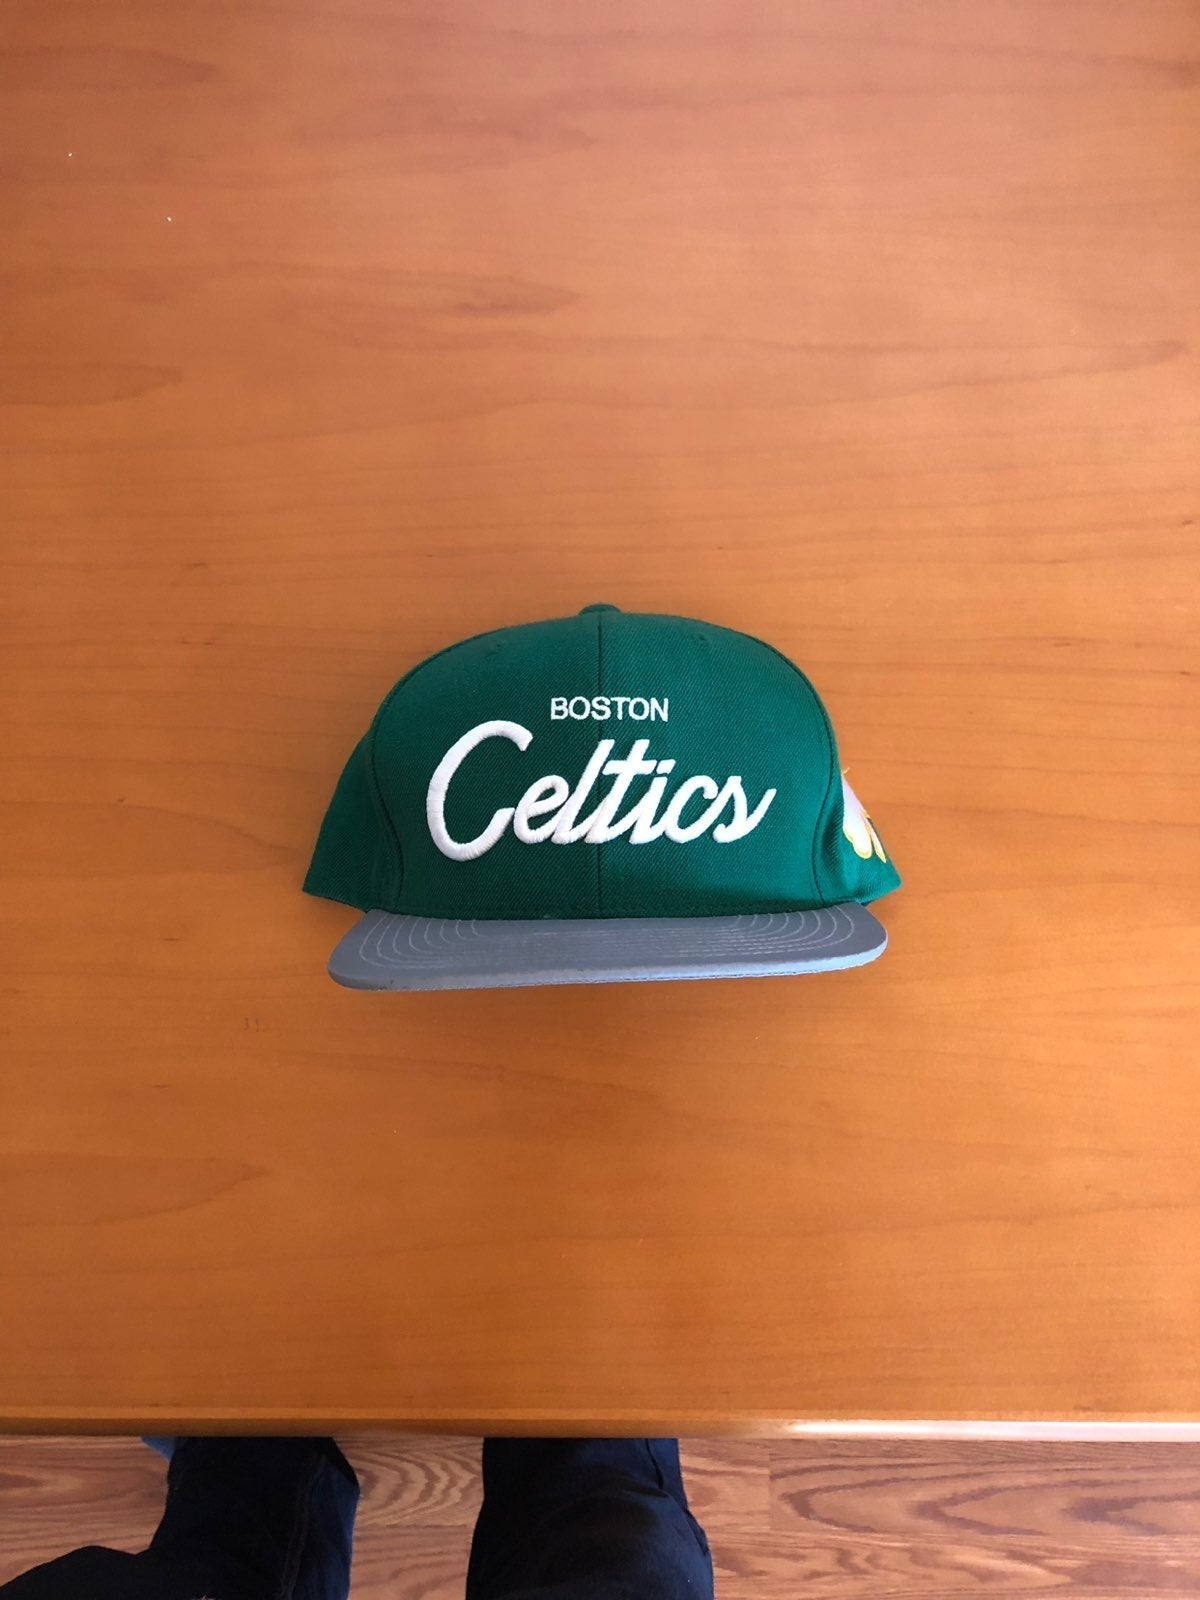 Boston Celtics Snapback Hat